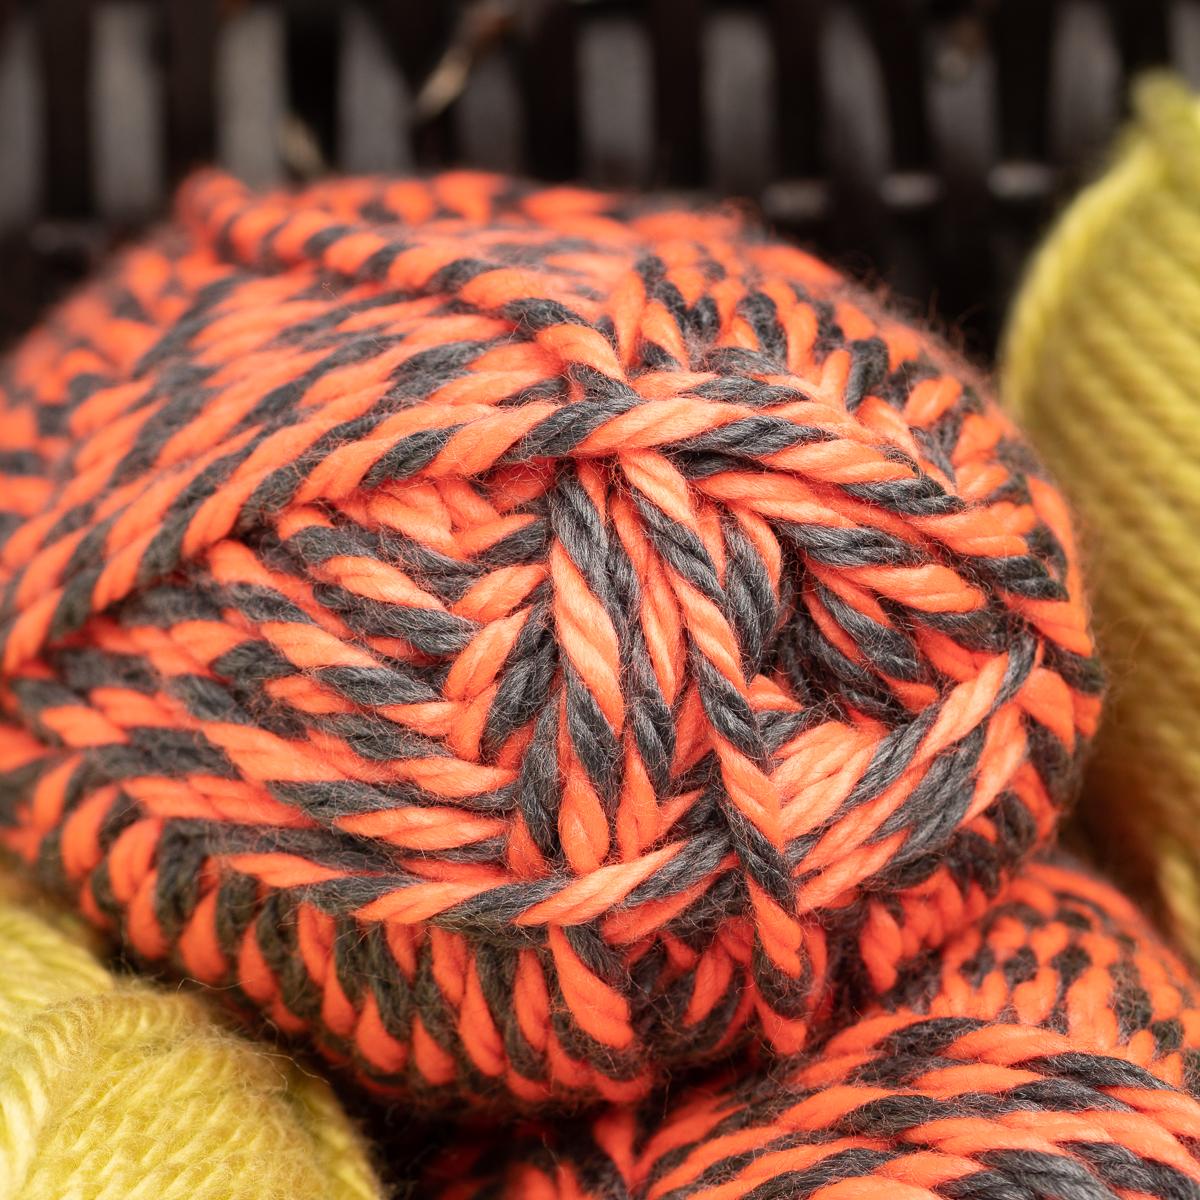 3pk-Lion-Brand-Hometown-USA-100-Acrylic-Yarn-Super-Bulky-6-Knit-Crochet-Skeins thumbnail 9